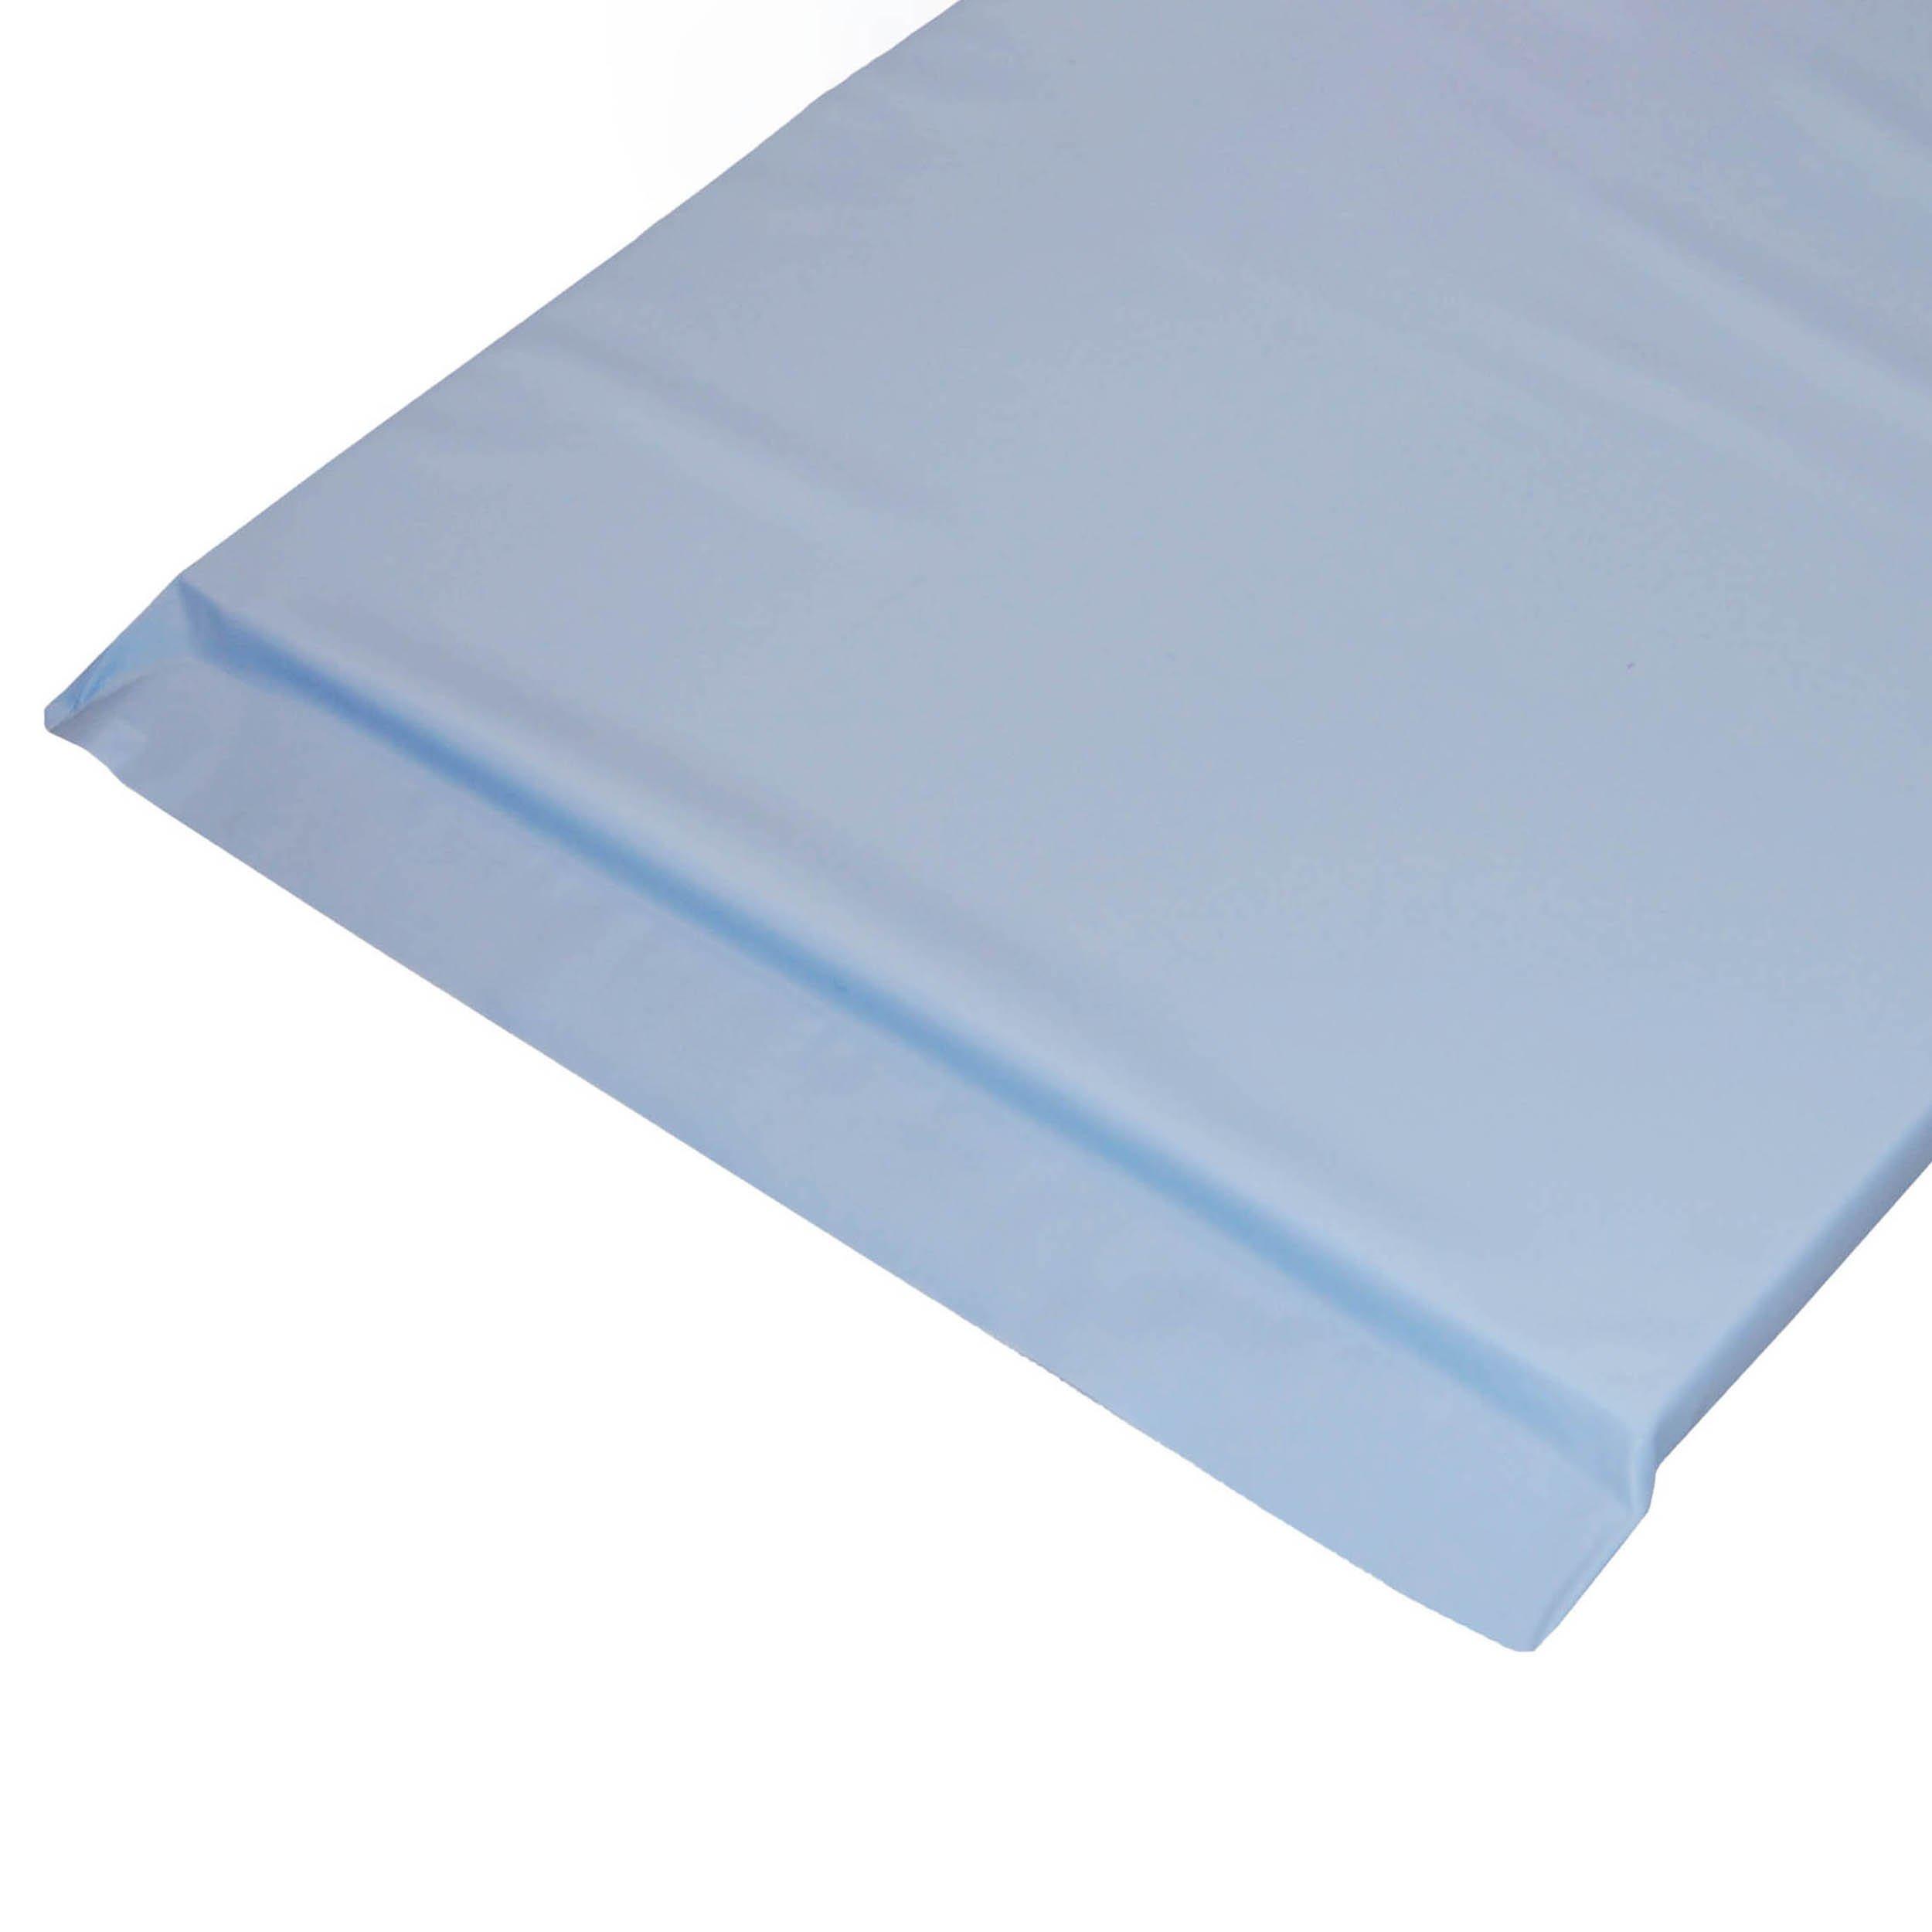 Economy Standard Plus Radiolucent X-Ray Firm Foam Table Pad - Light Blue Vinyl, No Grommets 80